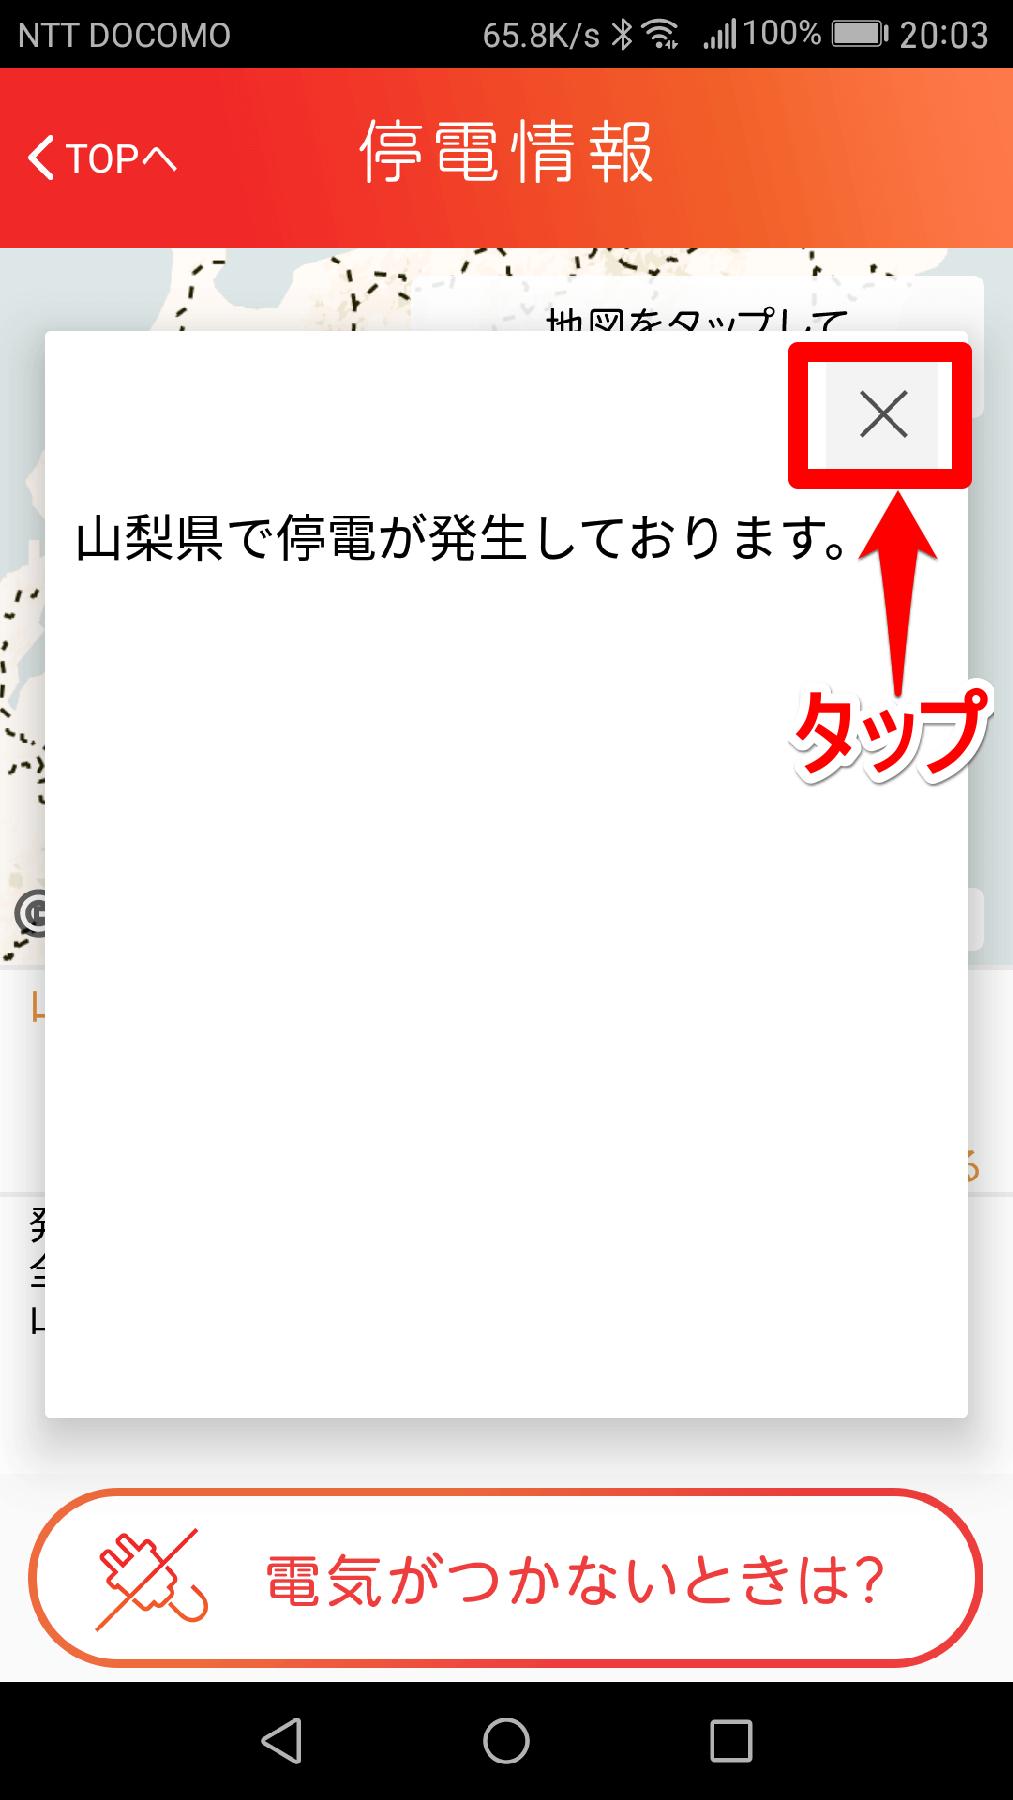 [TEPCO速報]アプリの[停電情報]画面その2